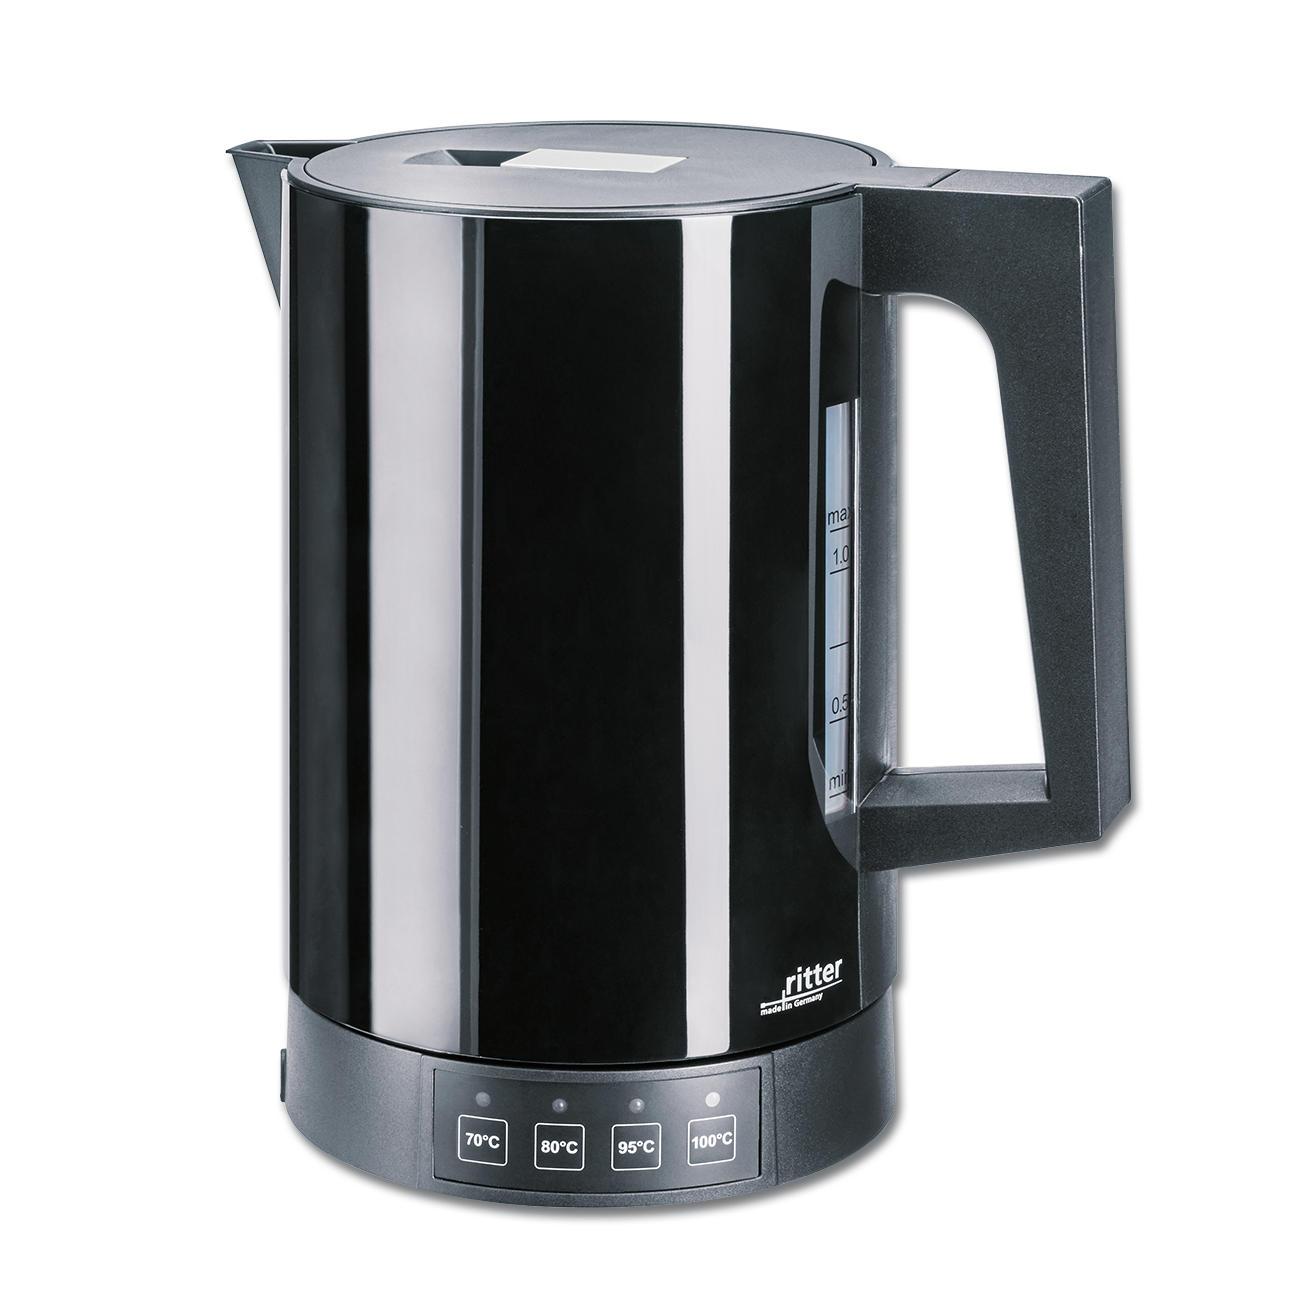 ritter toaster volcano 5 3 jahre garantie pro idee. Black Bedroom Furniture Sets. Home Design Ideas